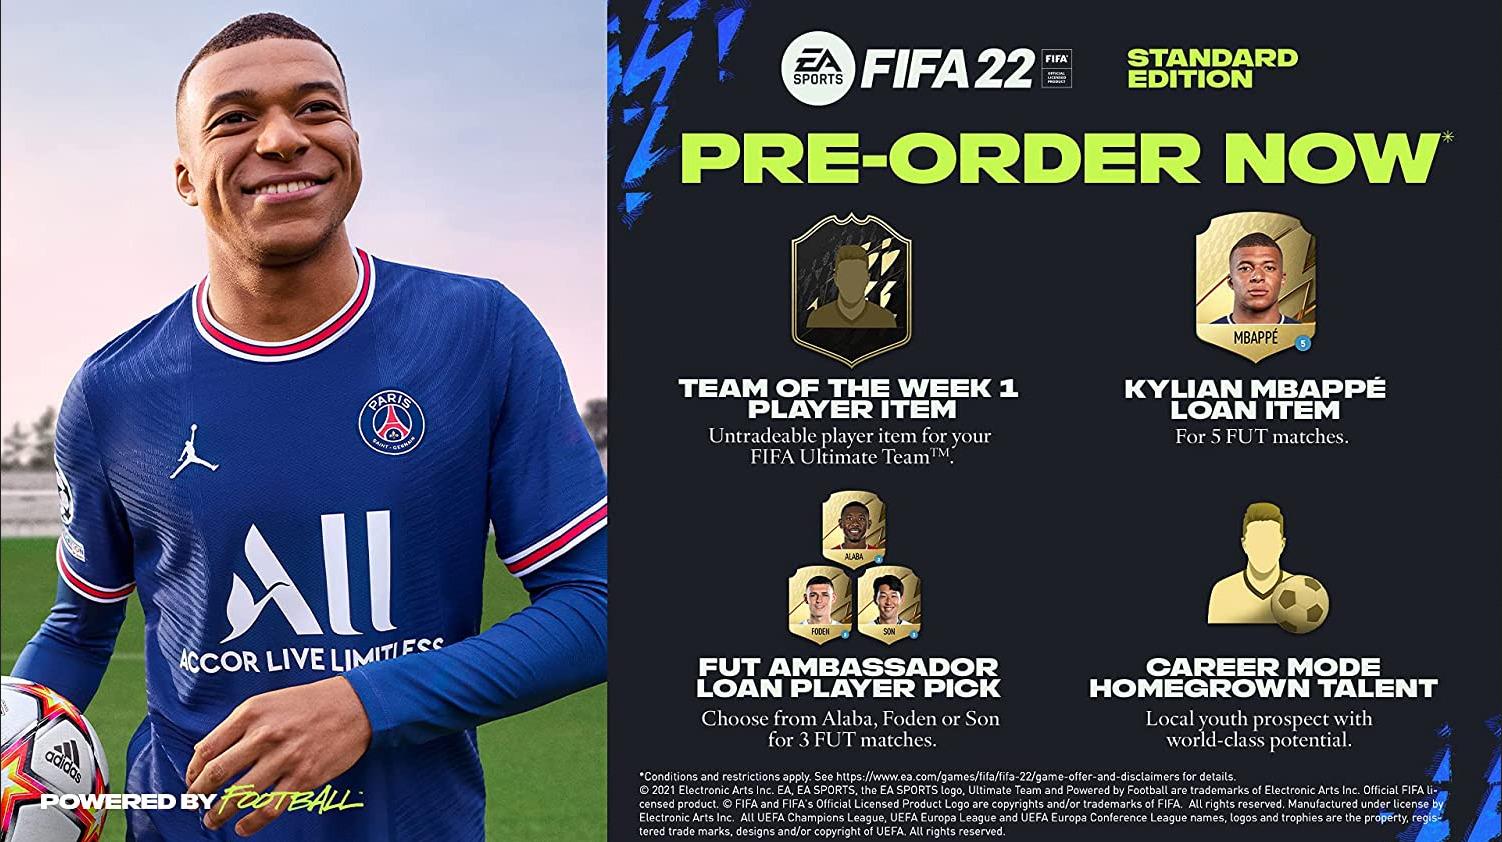 FIFA 22 Standard Edition Contents